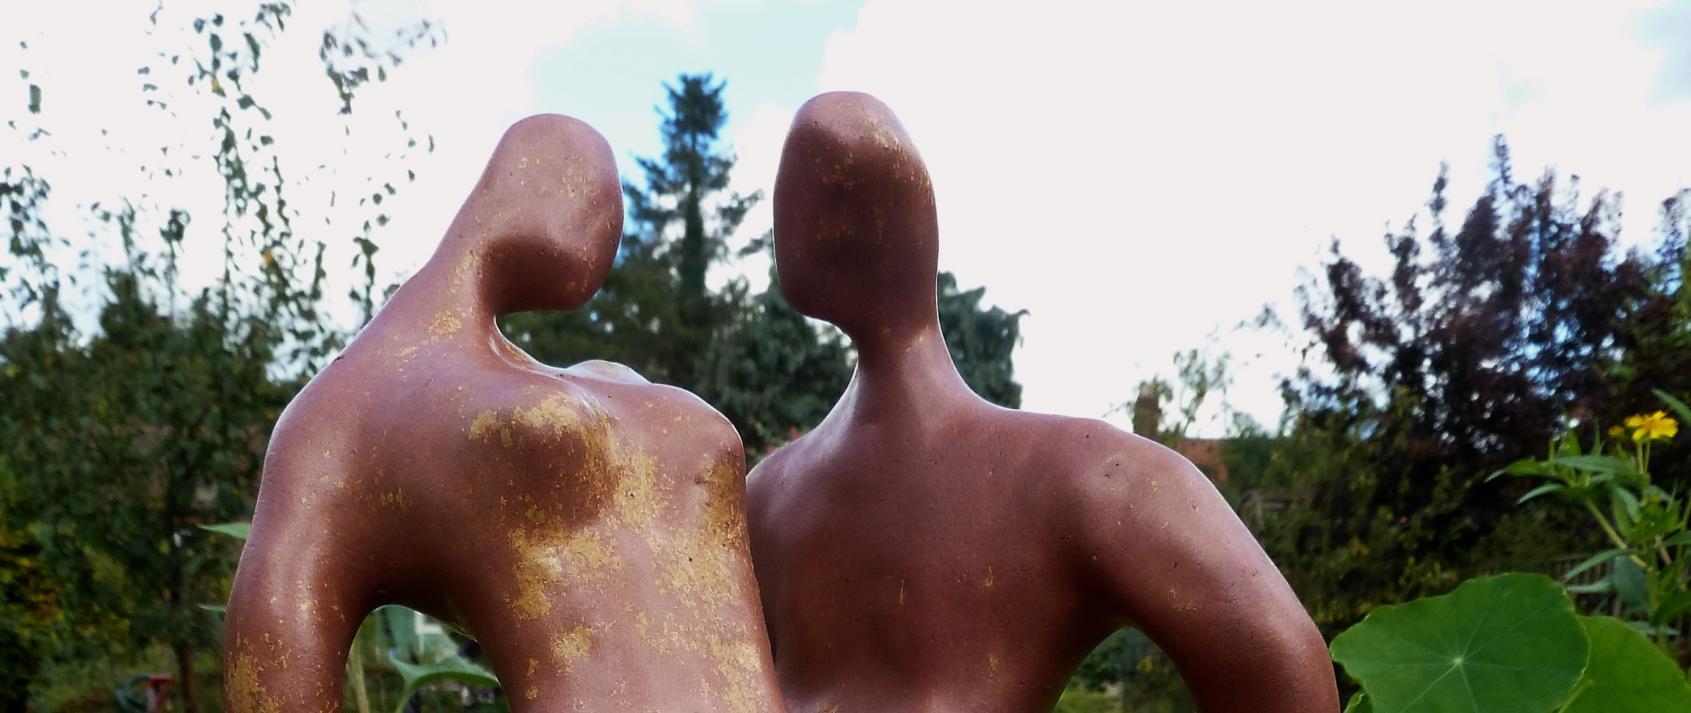 Sculpture Exhibition, Laure OM, The Garage, Norwich